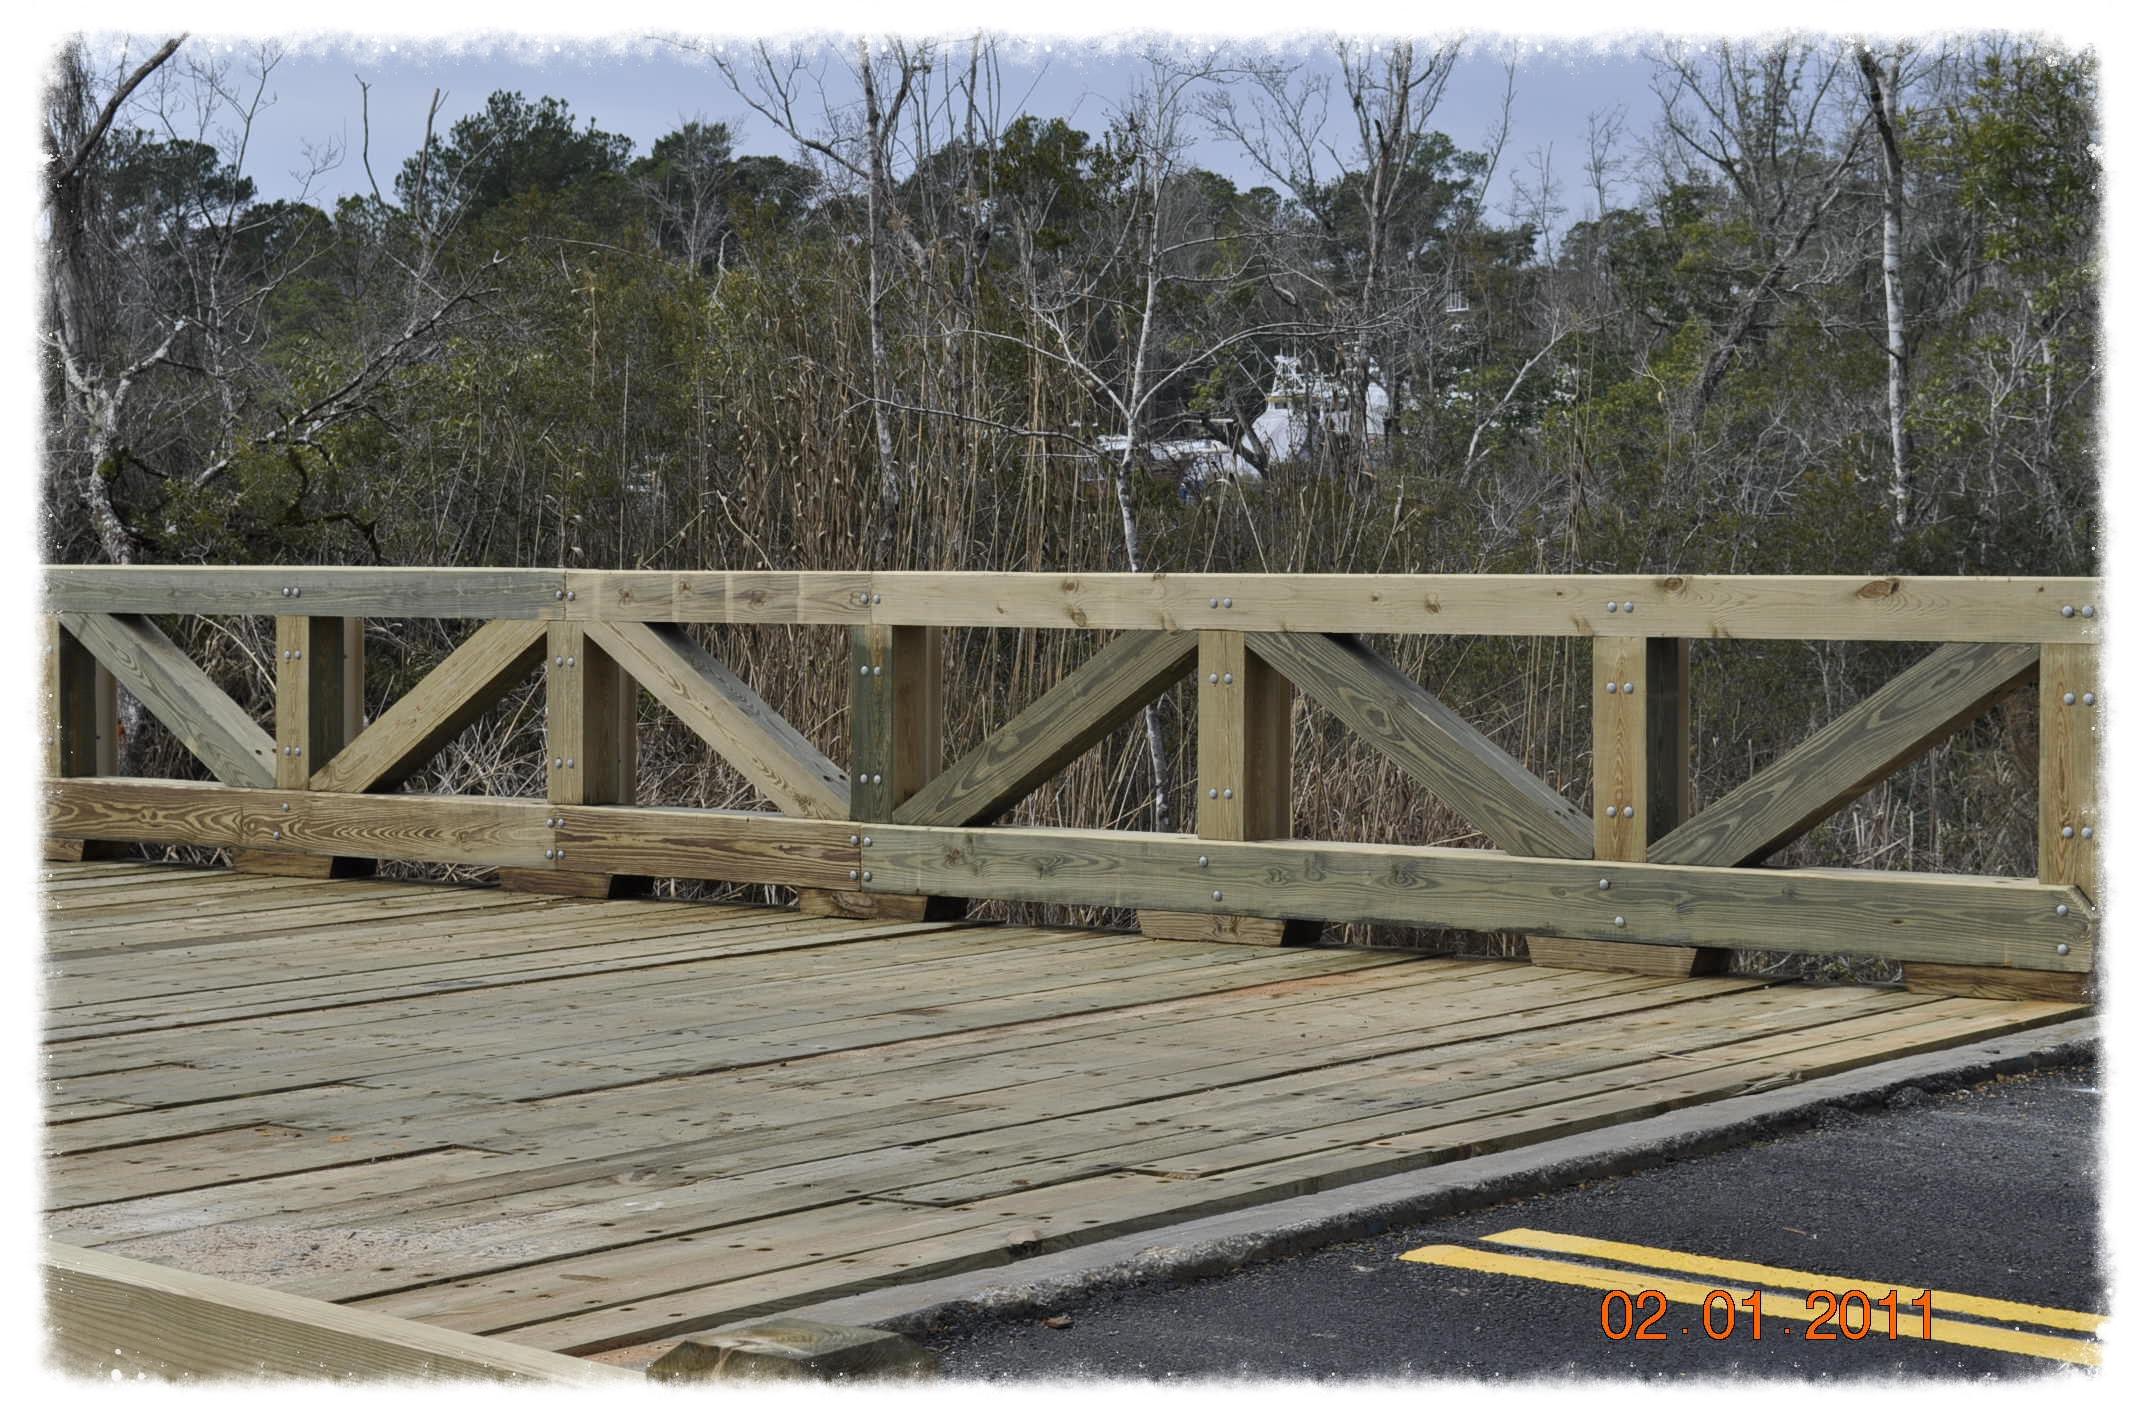 Vehicular Bridge with Guardrail